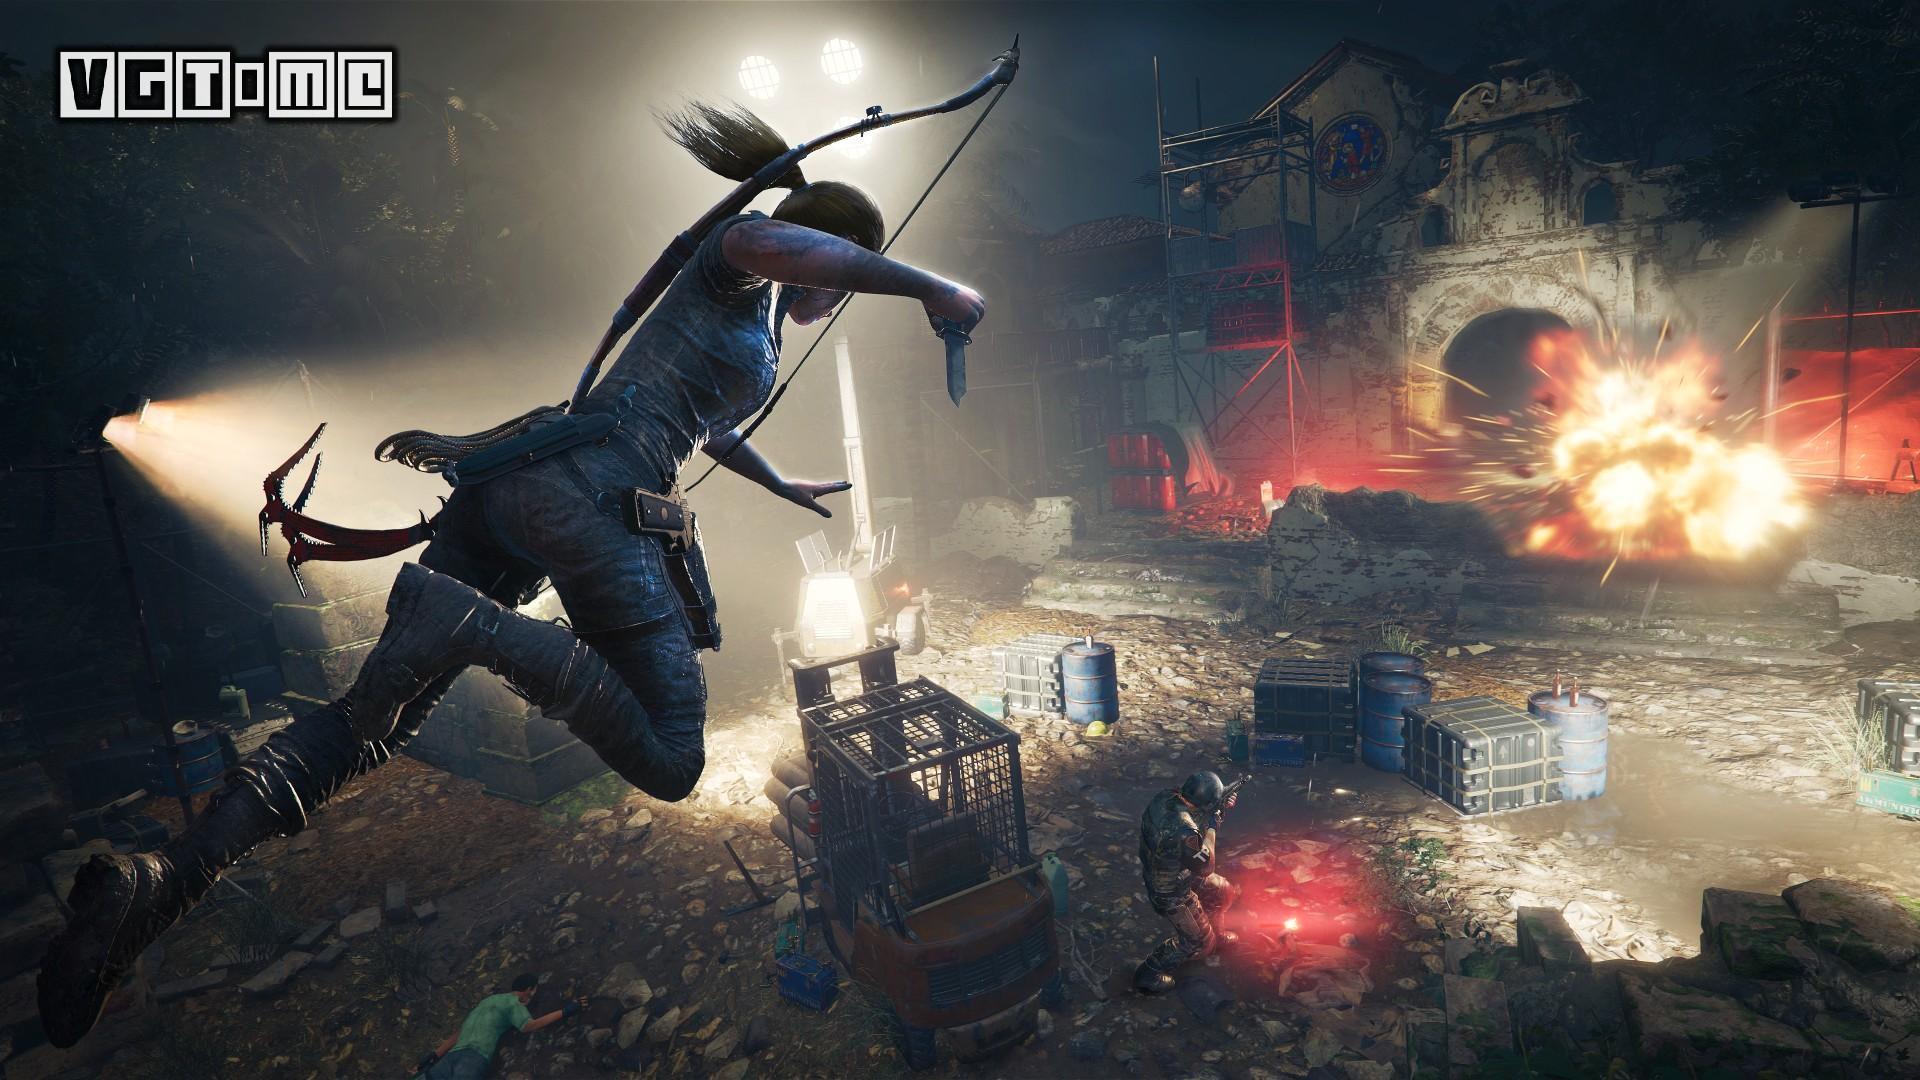 Square Enix公布2019Q2财报:游戏部门利润下滑_阿里财报2019